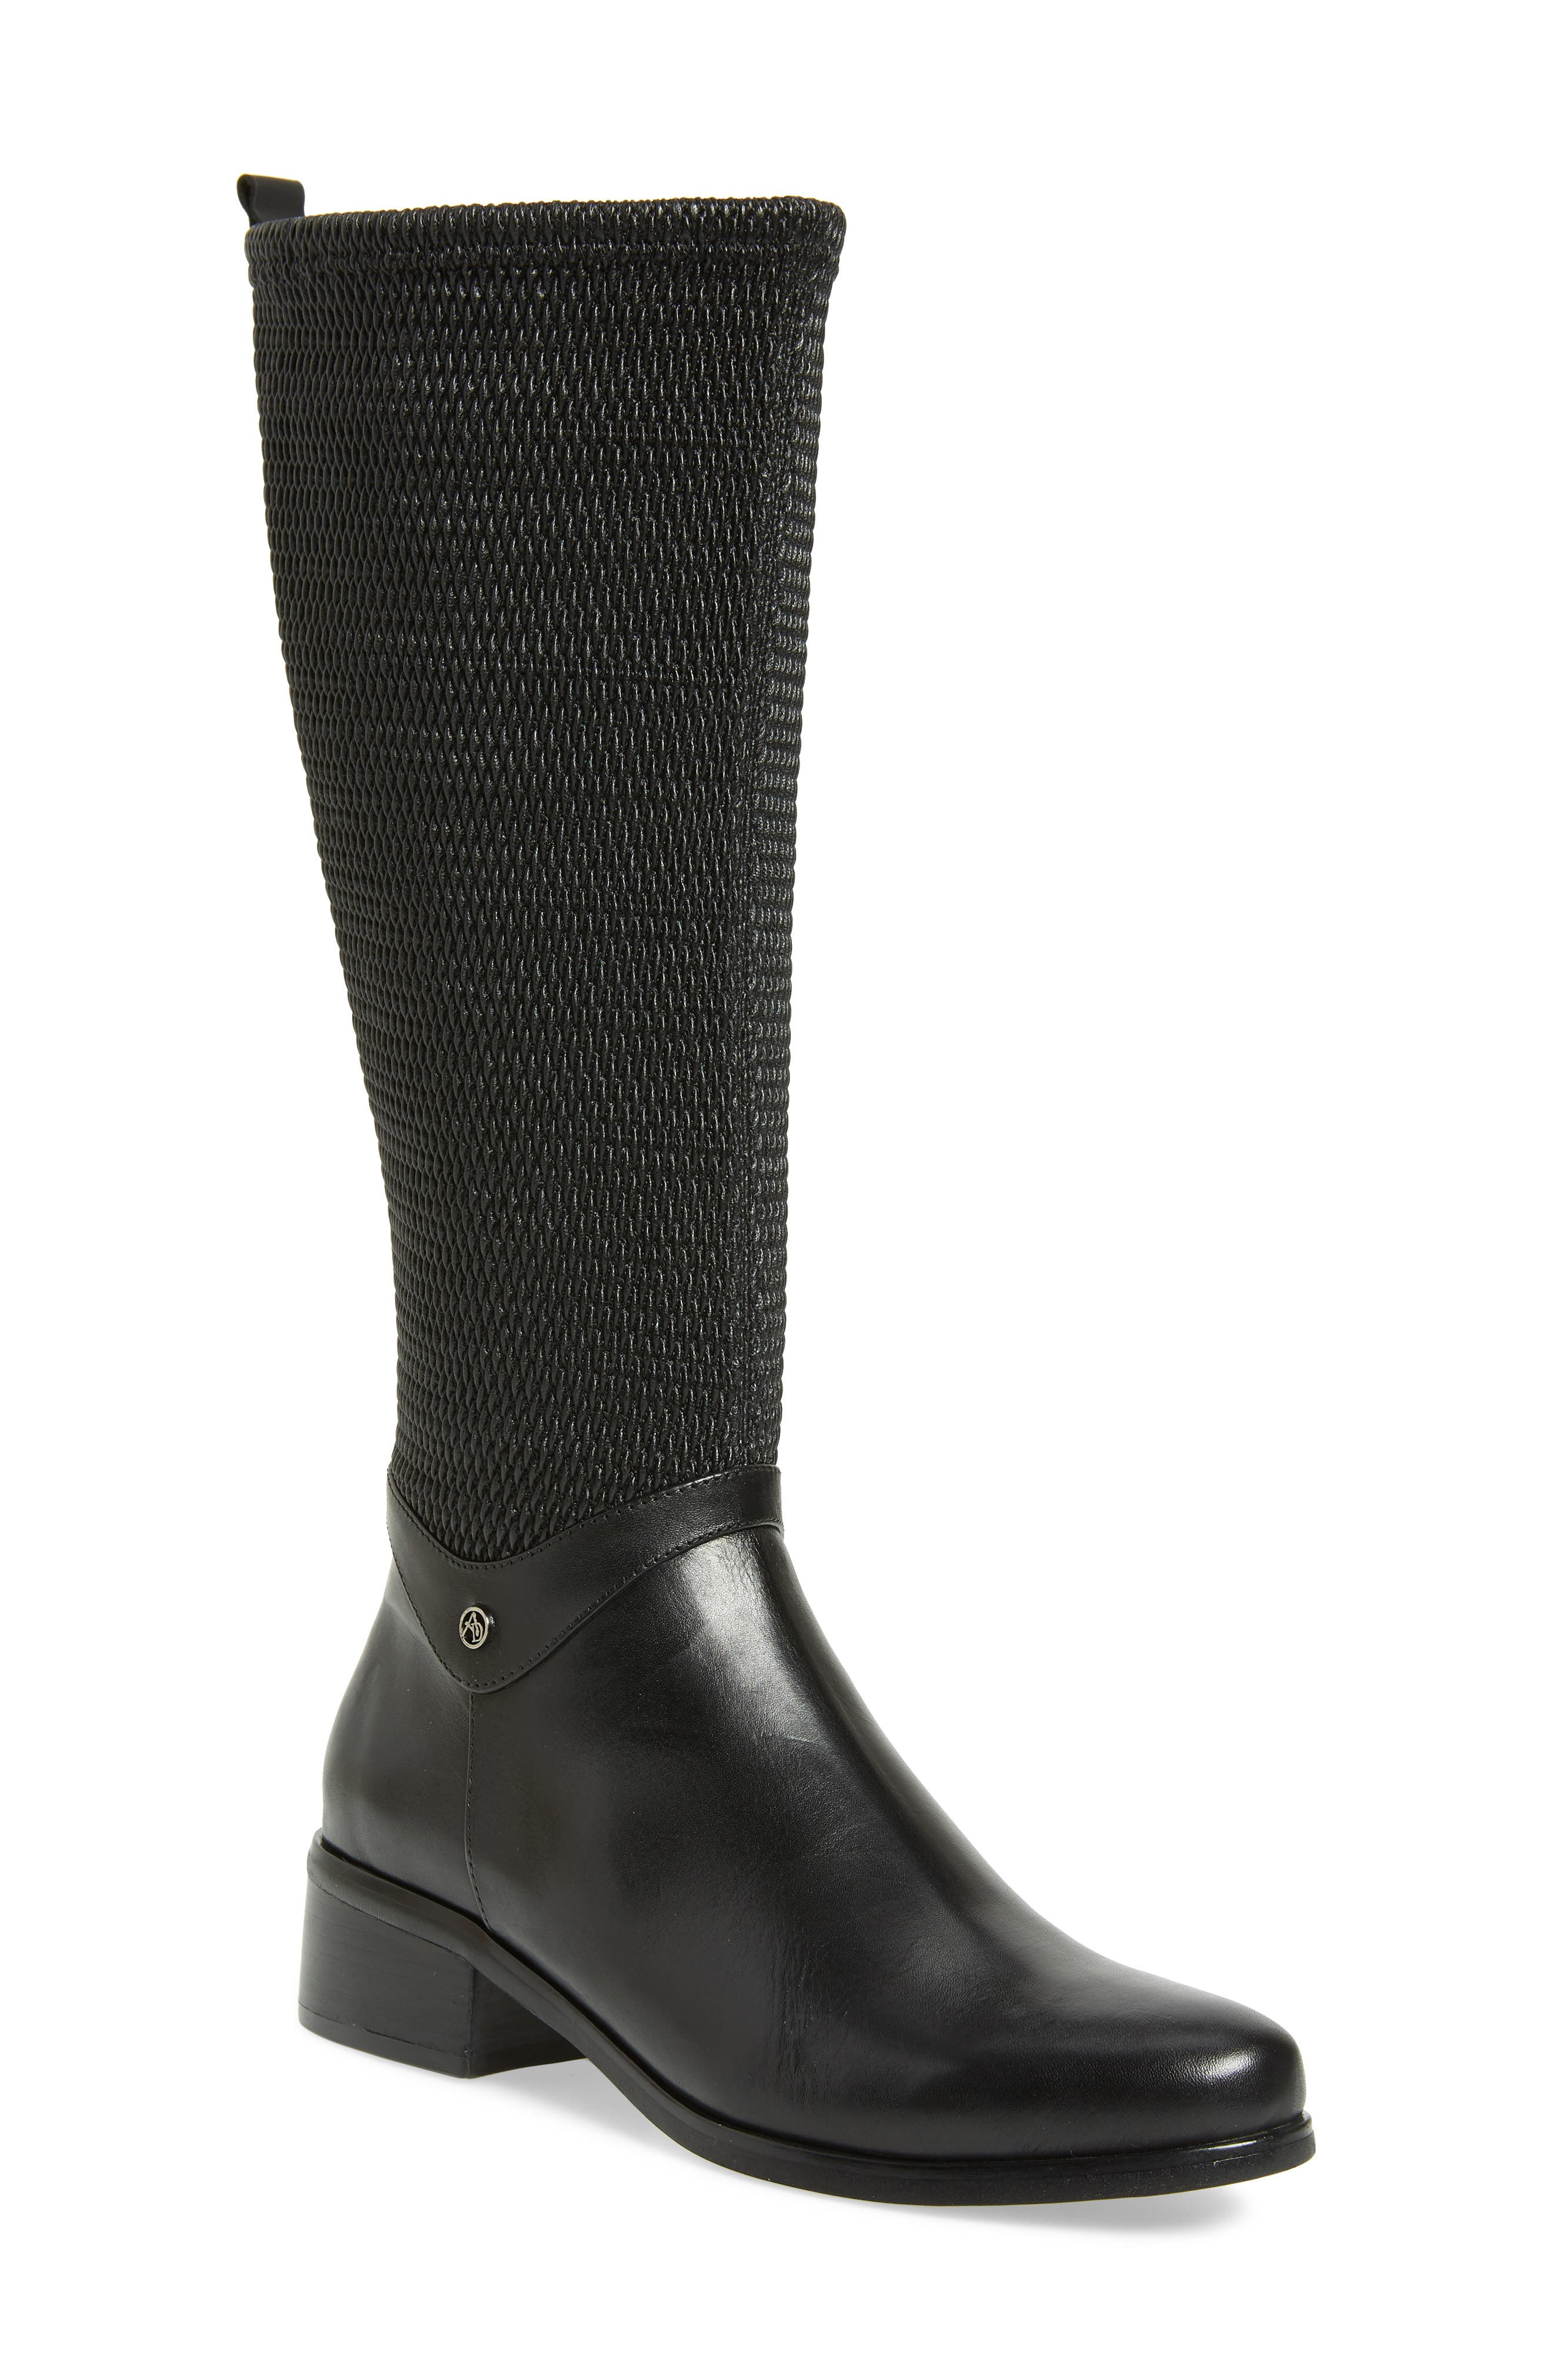 AQUADIVA Kallena Waterproof Knee High Boot, Main, color, BLACK LEATHER